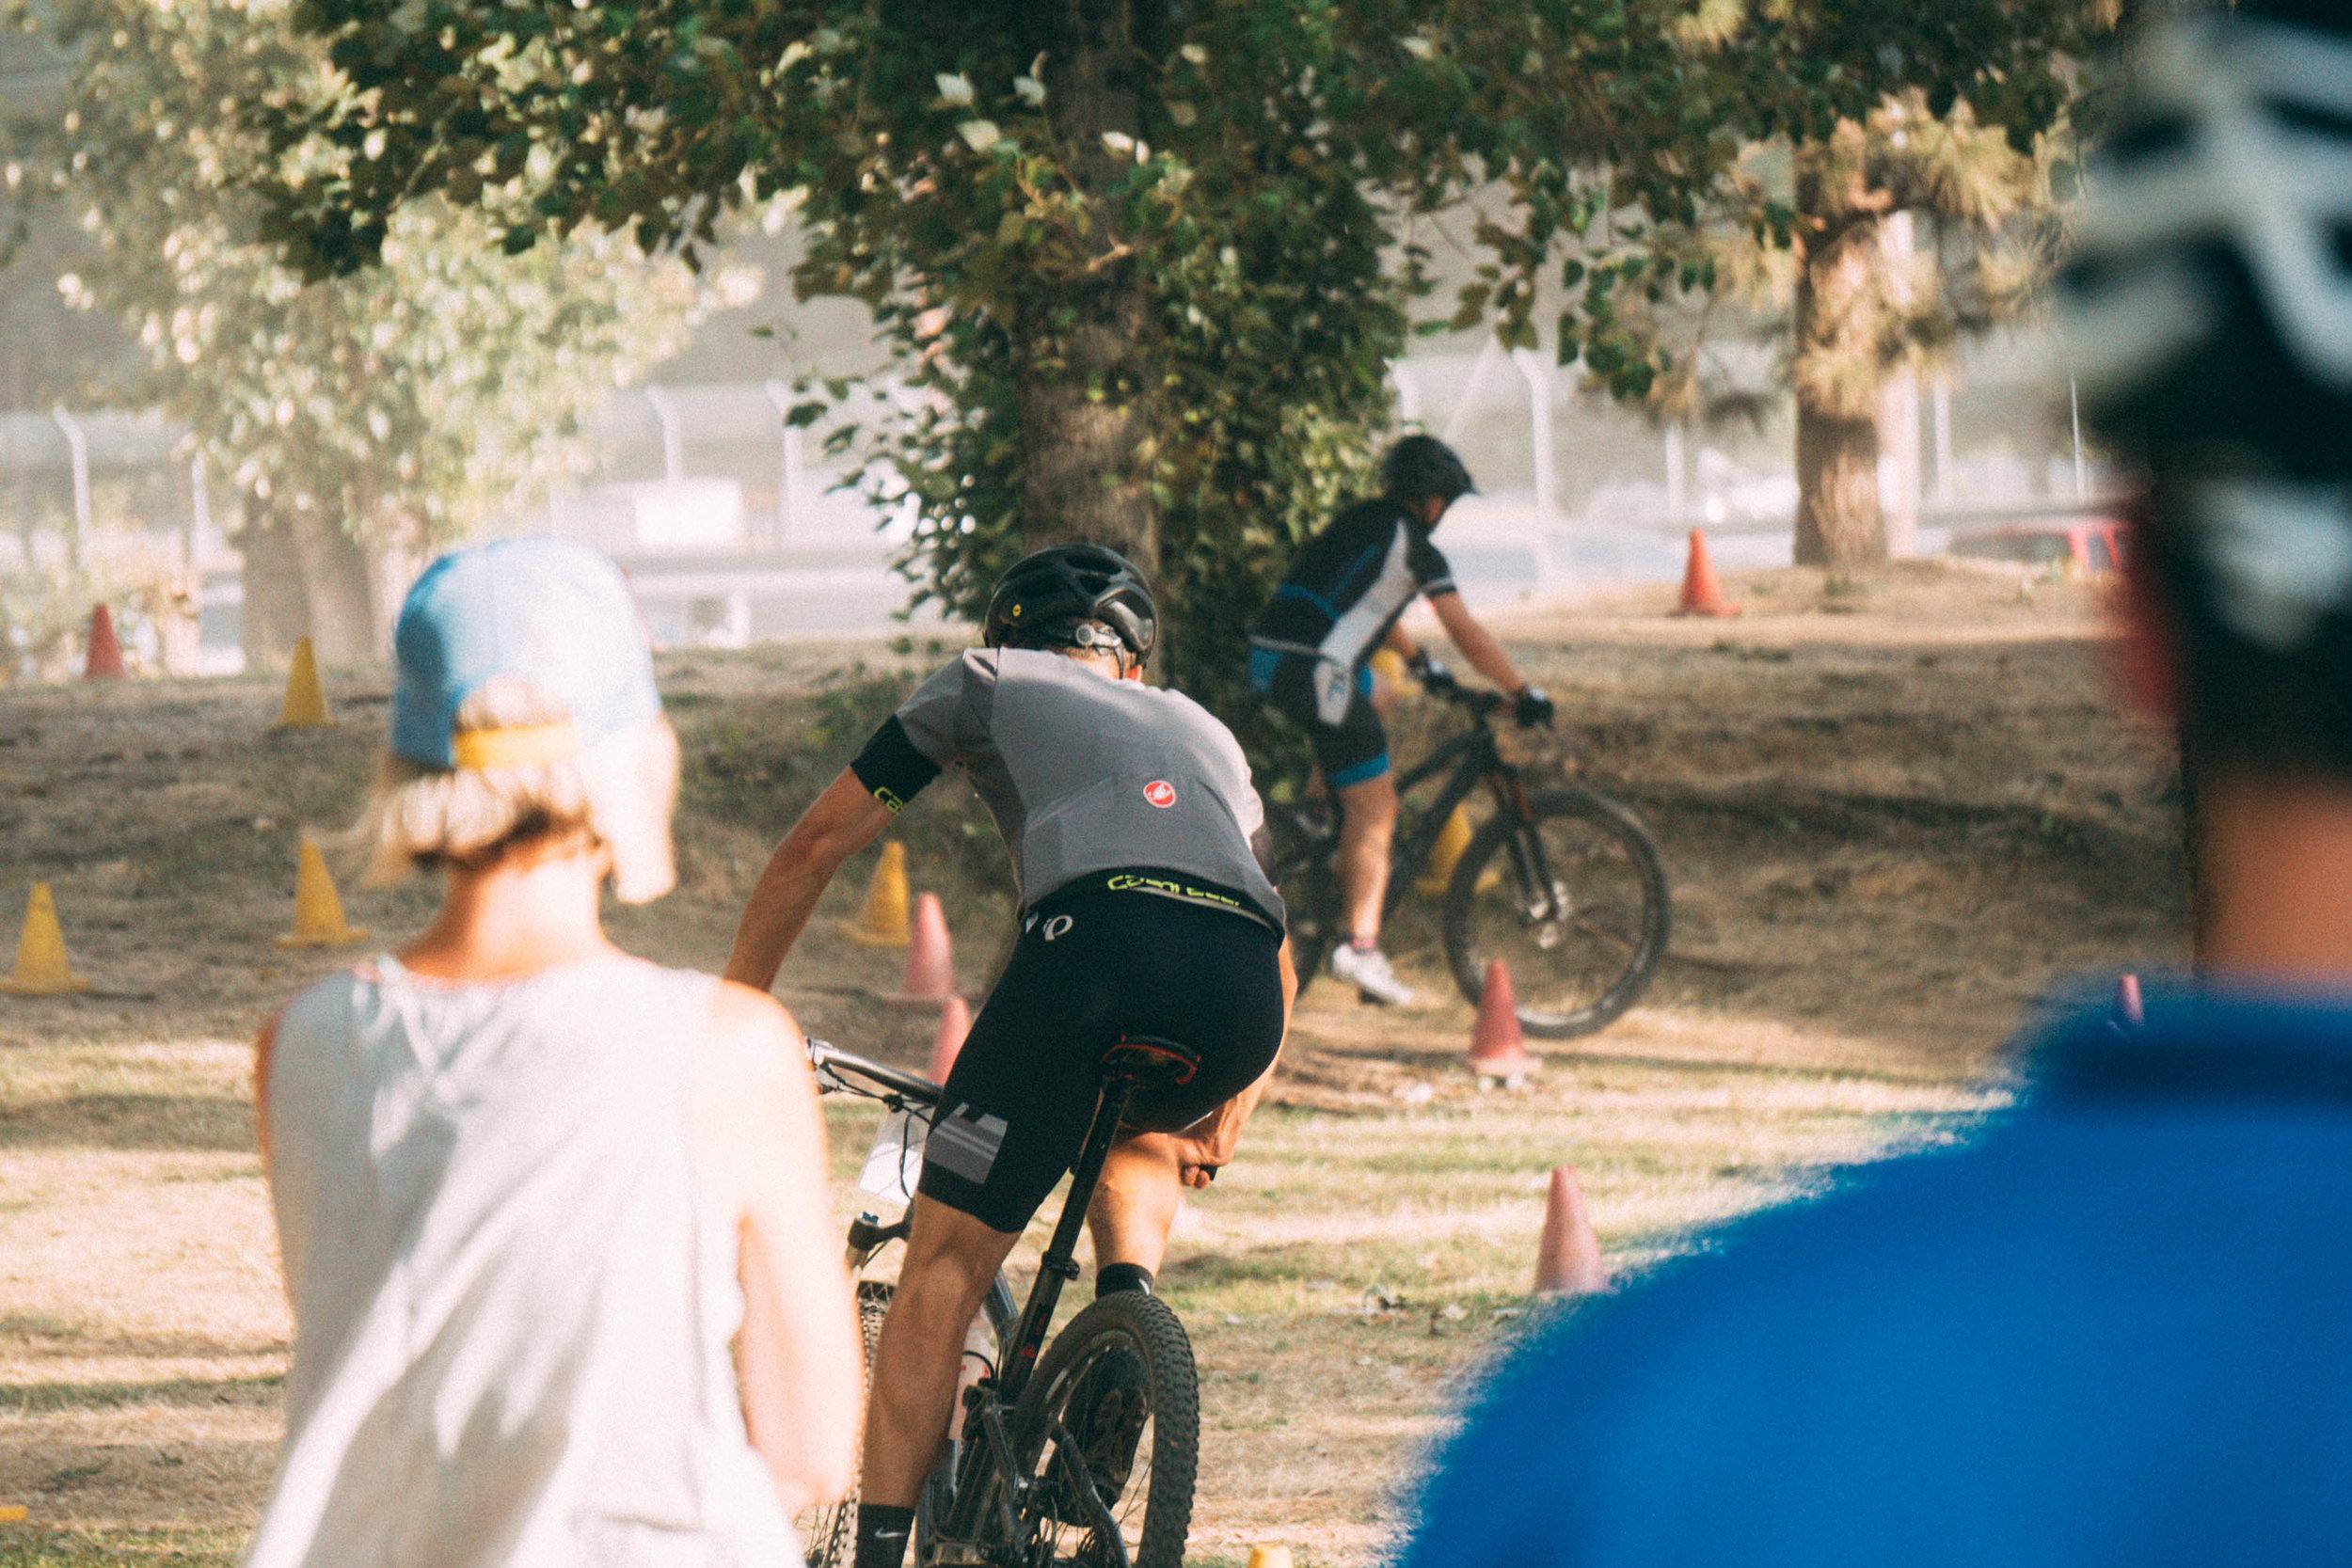 Short_Race7_53.jpg